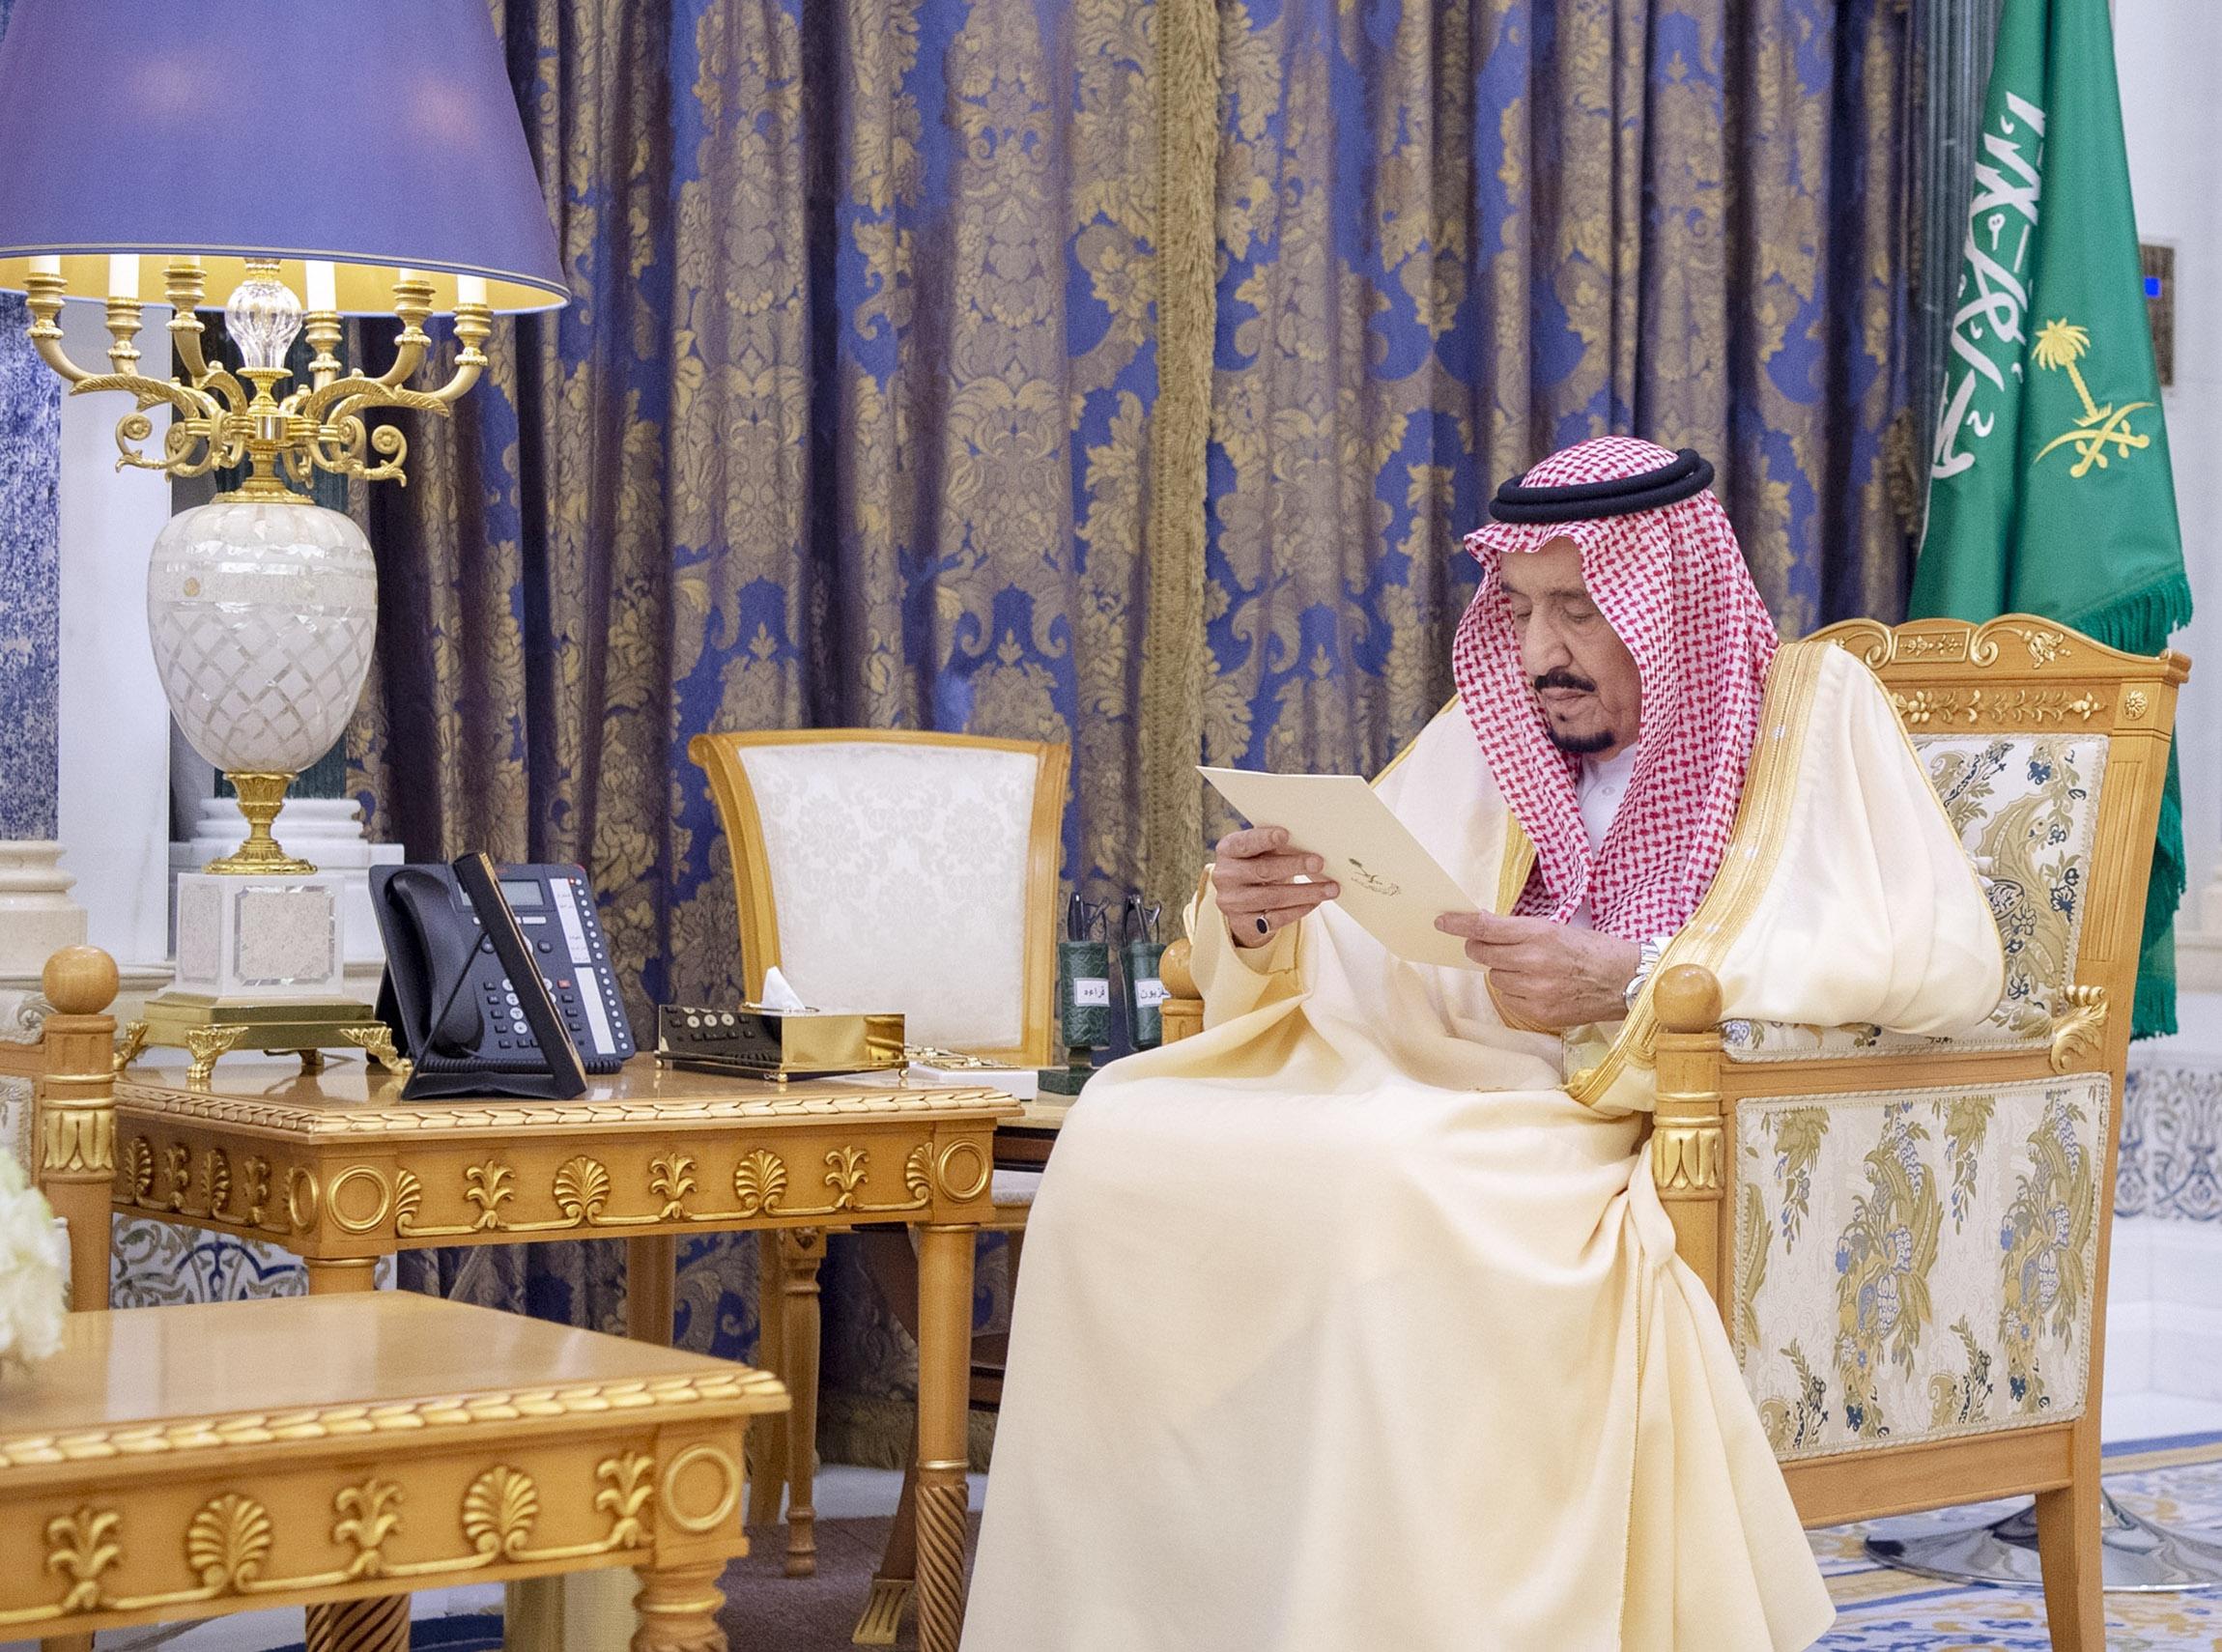 Saudi Arabian King Salman bin Abdulaziz al-Saud attends an oath ceremony on March 8, in Riyadh, Saudi Arabia.